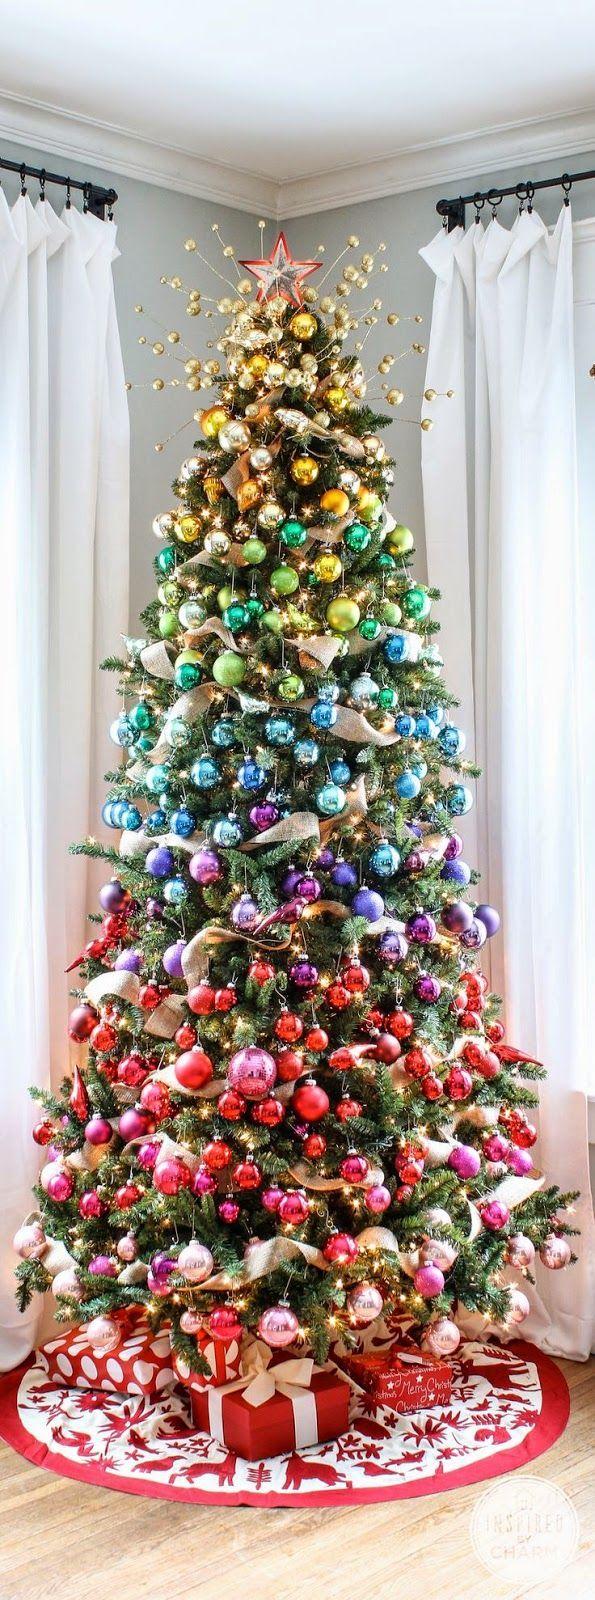 Inspiring snaps: Christmas inspiration